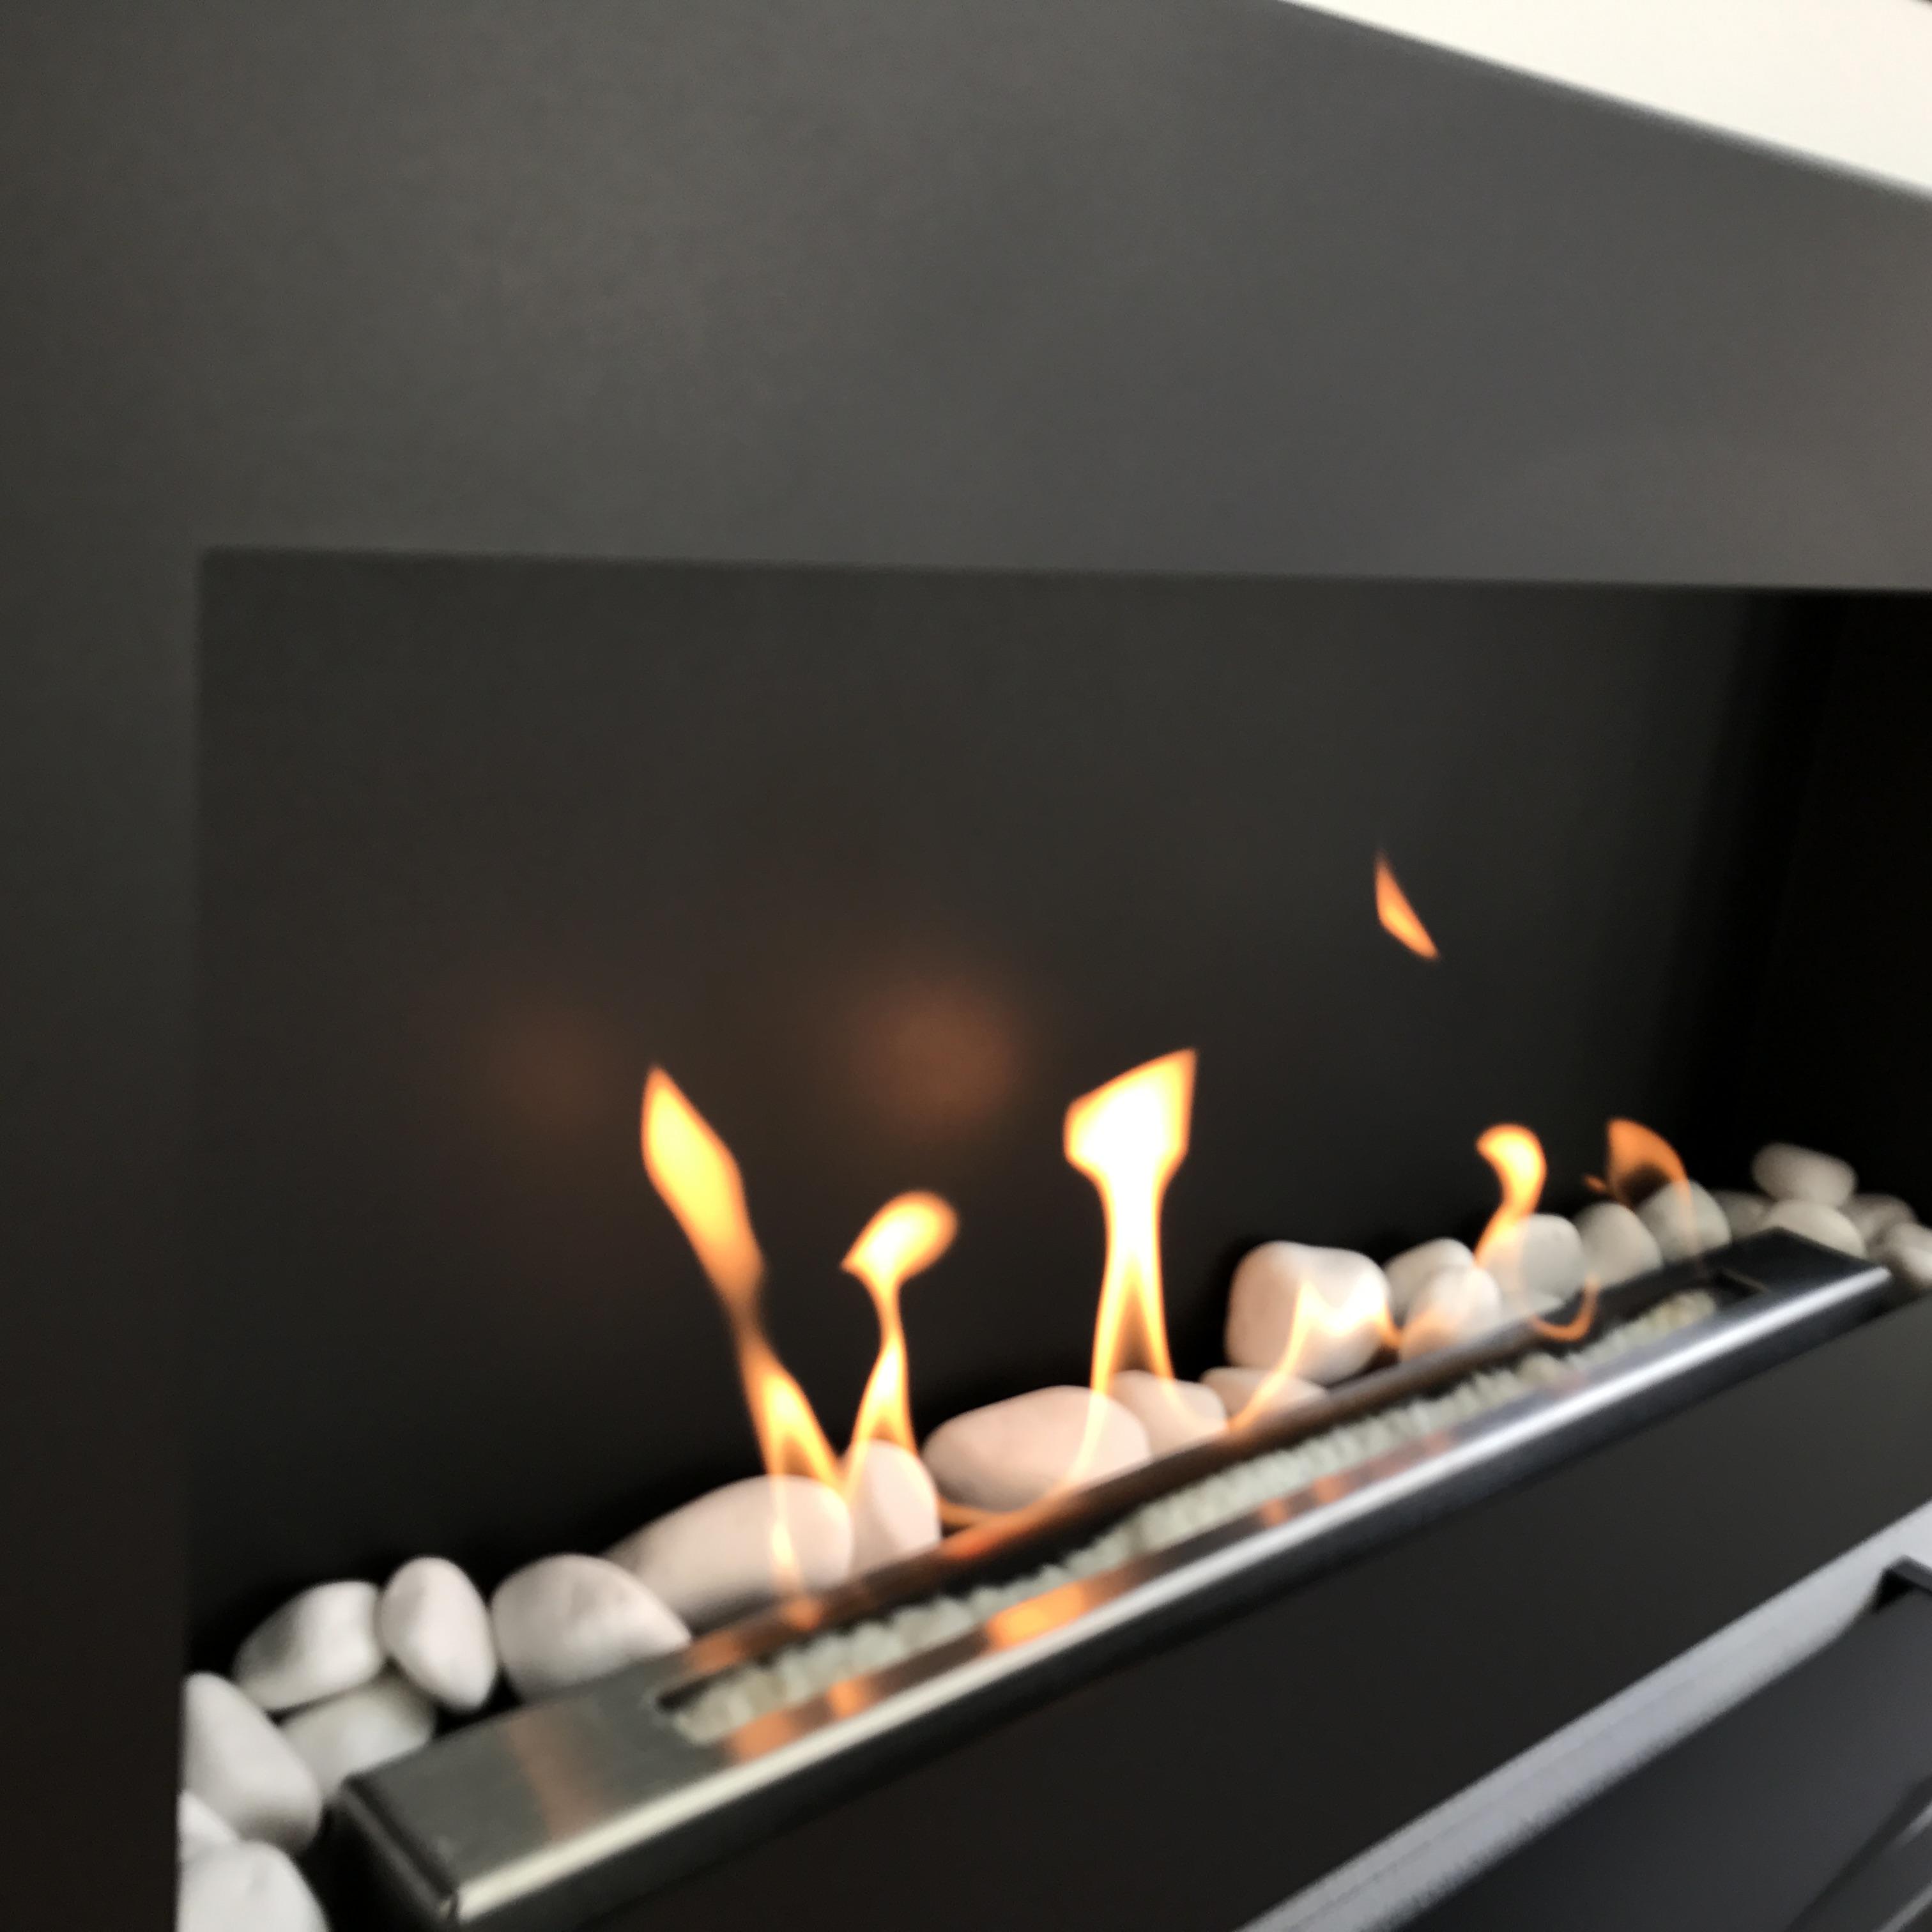 weltlux bio ethanol kamin biokamin model flat 900 schwarz neu. Black Bedroom Furniture Sets. Home Design Ideas